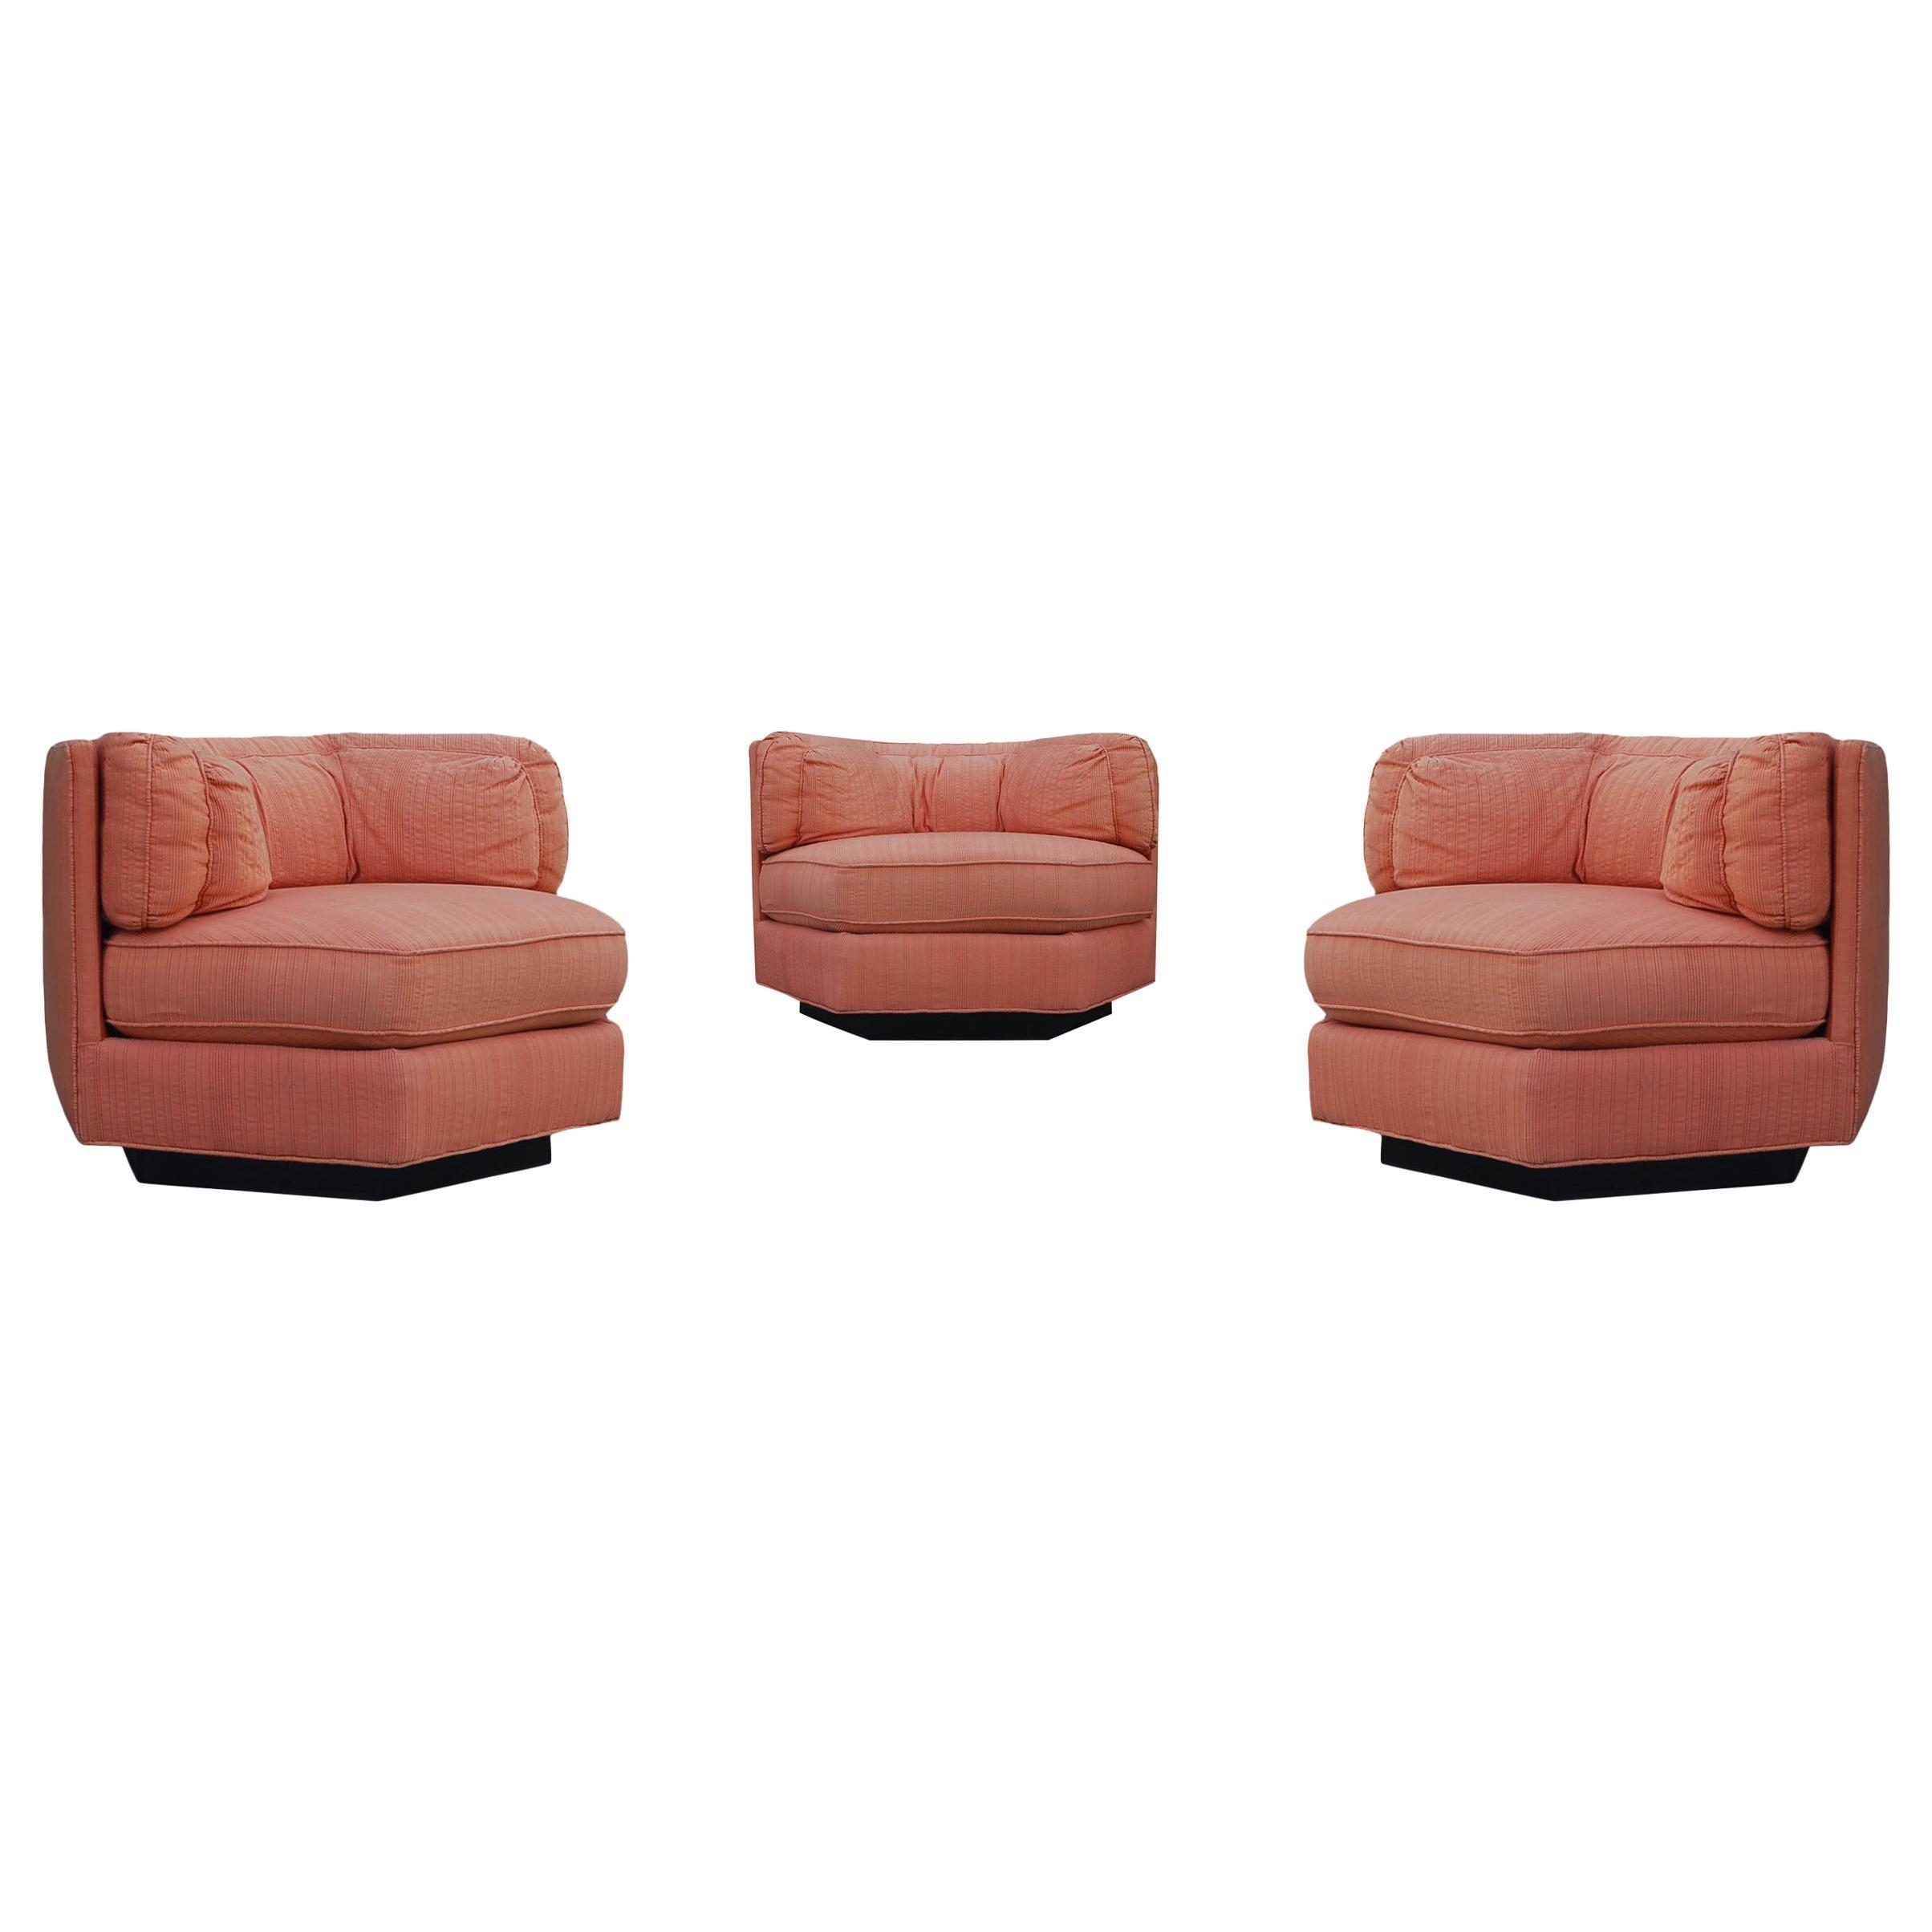 Trio of Hexagonal Mid-Century Modern Club Chairs by Bernhardt, Plinth Bases